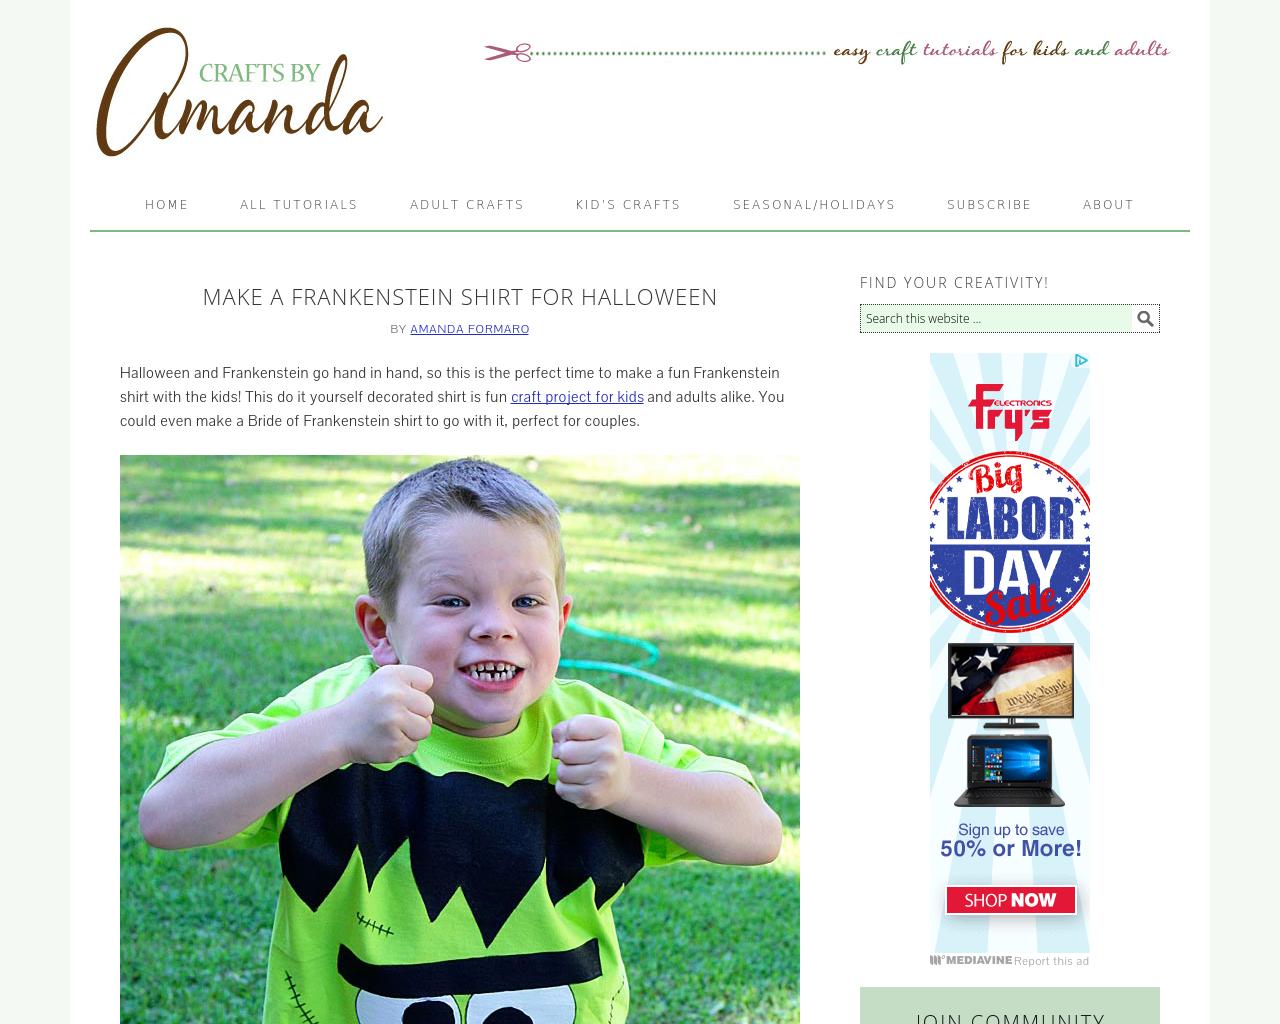 Crafts-By-Amanda-Advertising-Reviews-Pricing